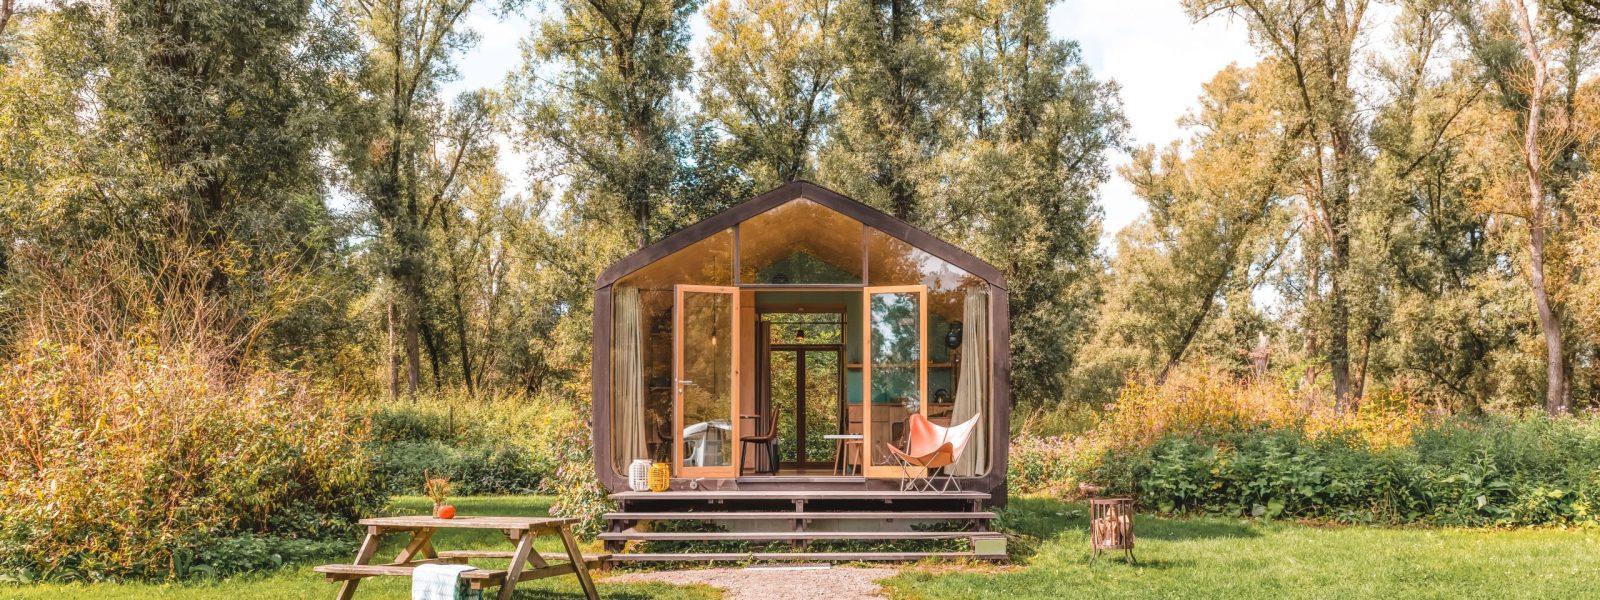 Wikkelhouse huren: overnachten in duurzame tiny houses